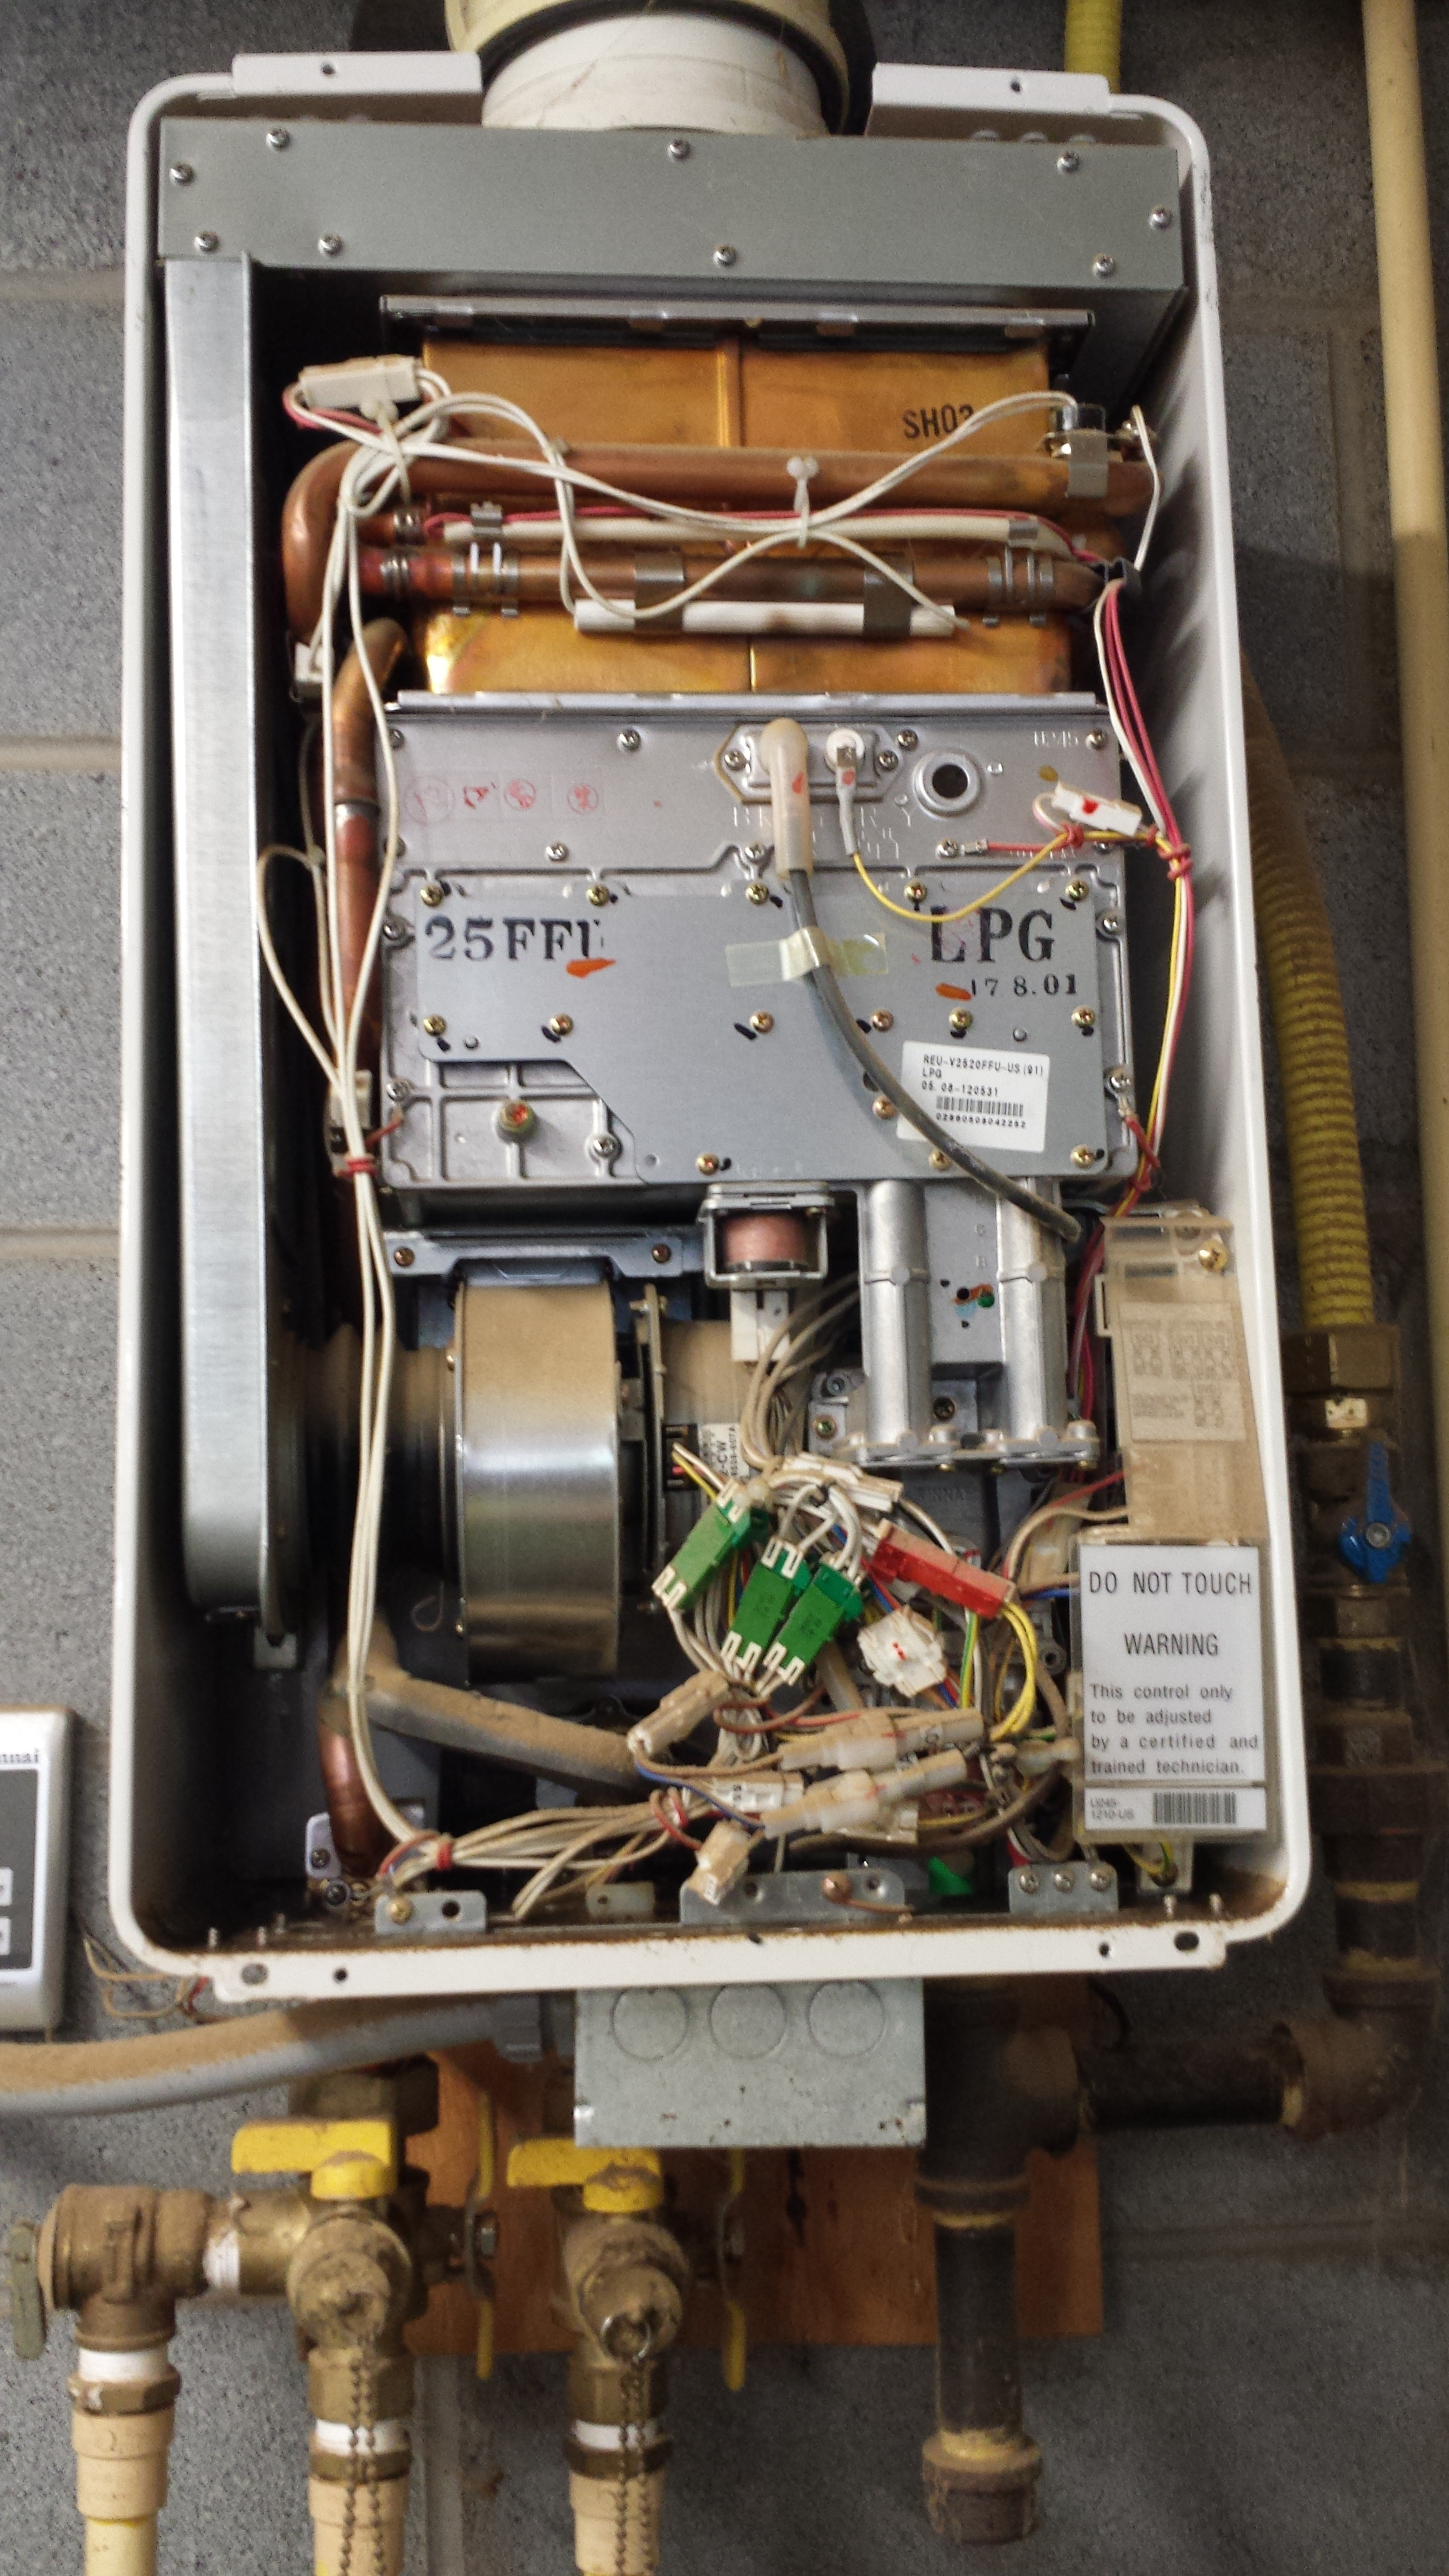 Rinnai R53 Water Heater Leaking  U2014 Heating Help  The Wall